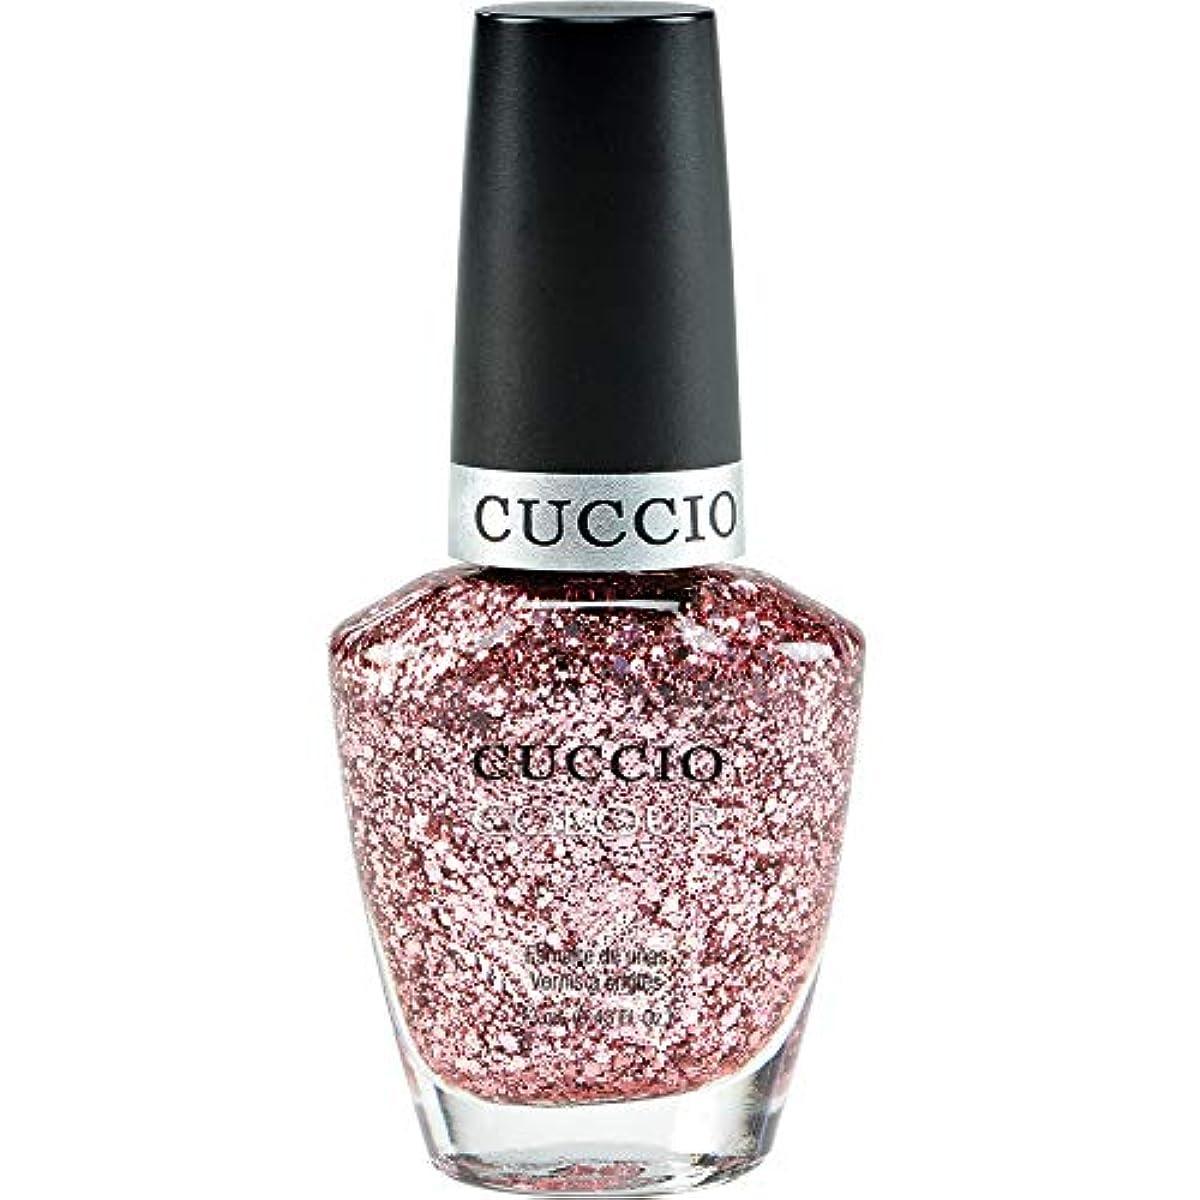 呪い社会主義者波紋Cuccio Colour Gloss Lacquer - Fever of Love - 0.43oz / 13ml